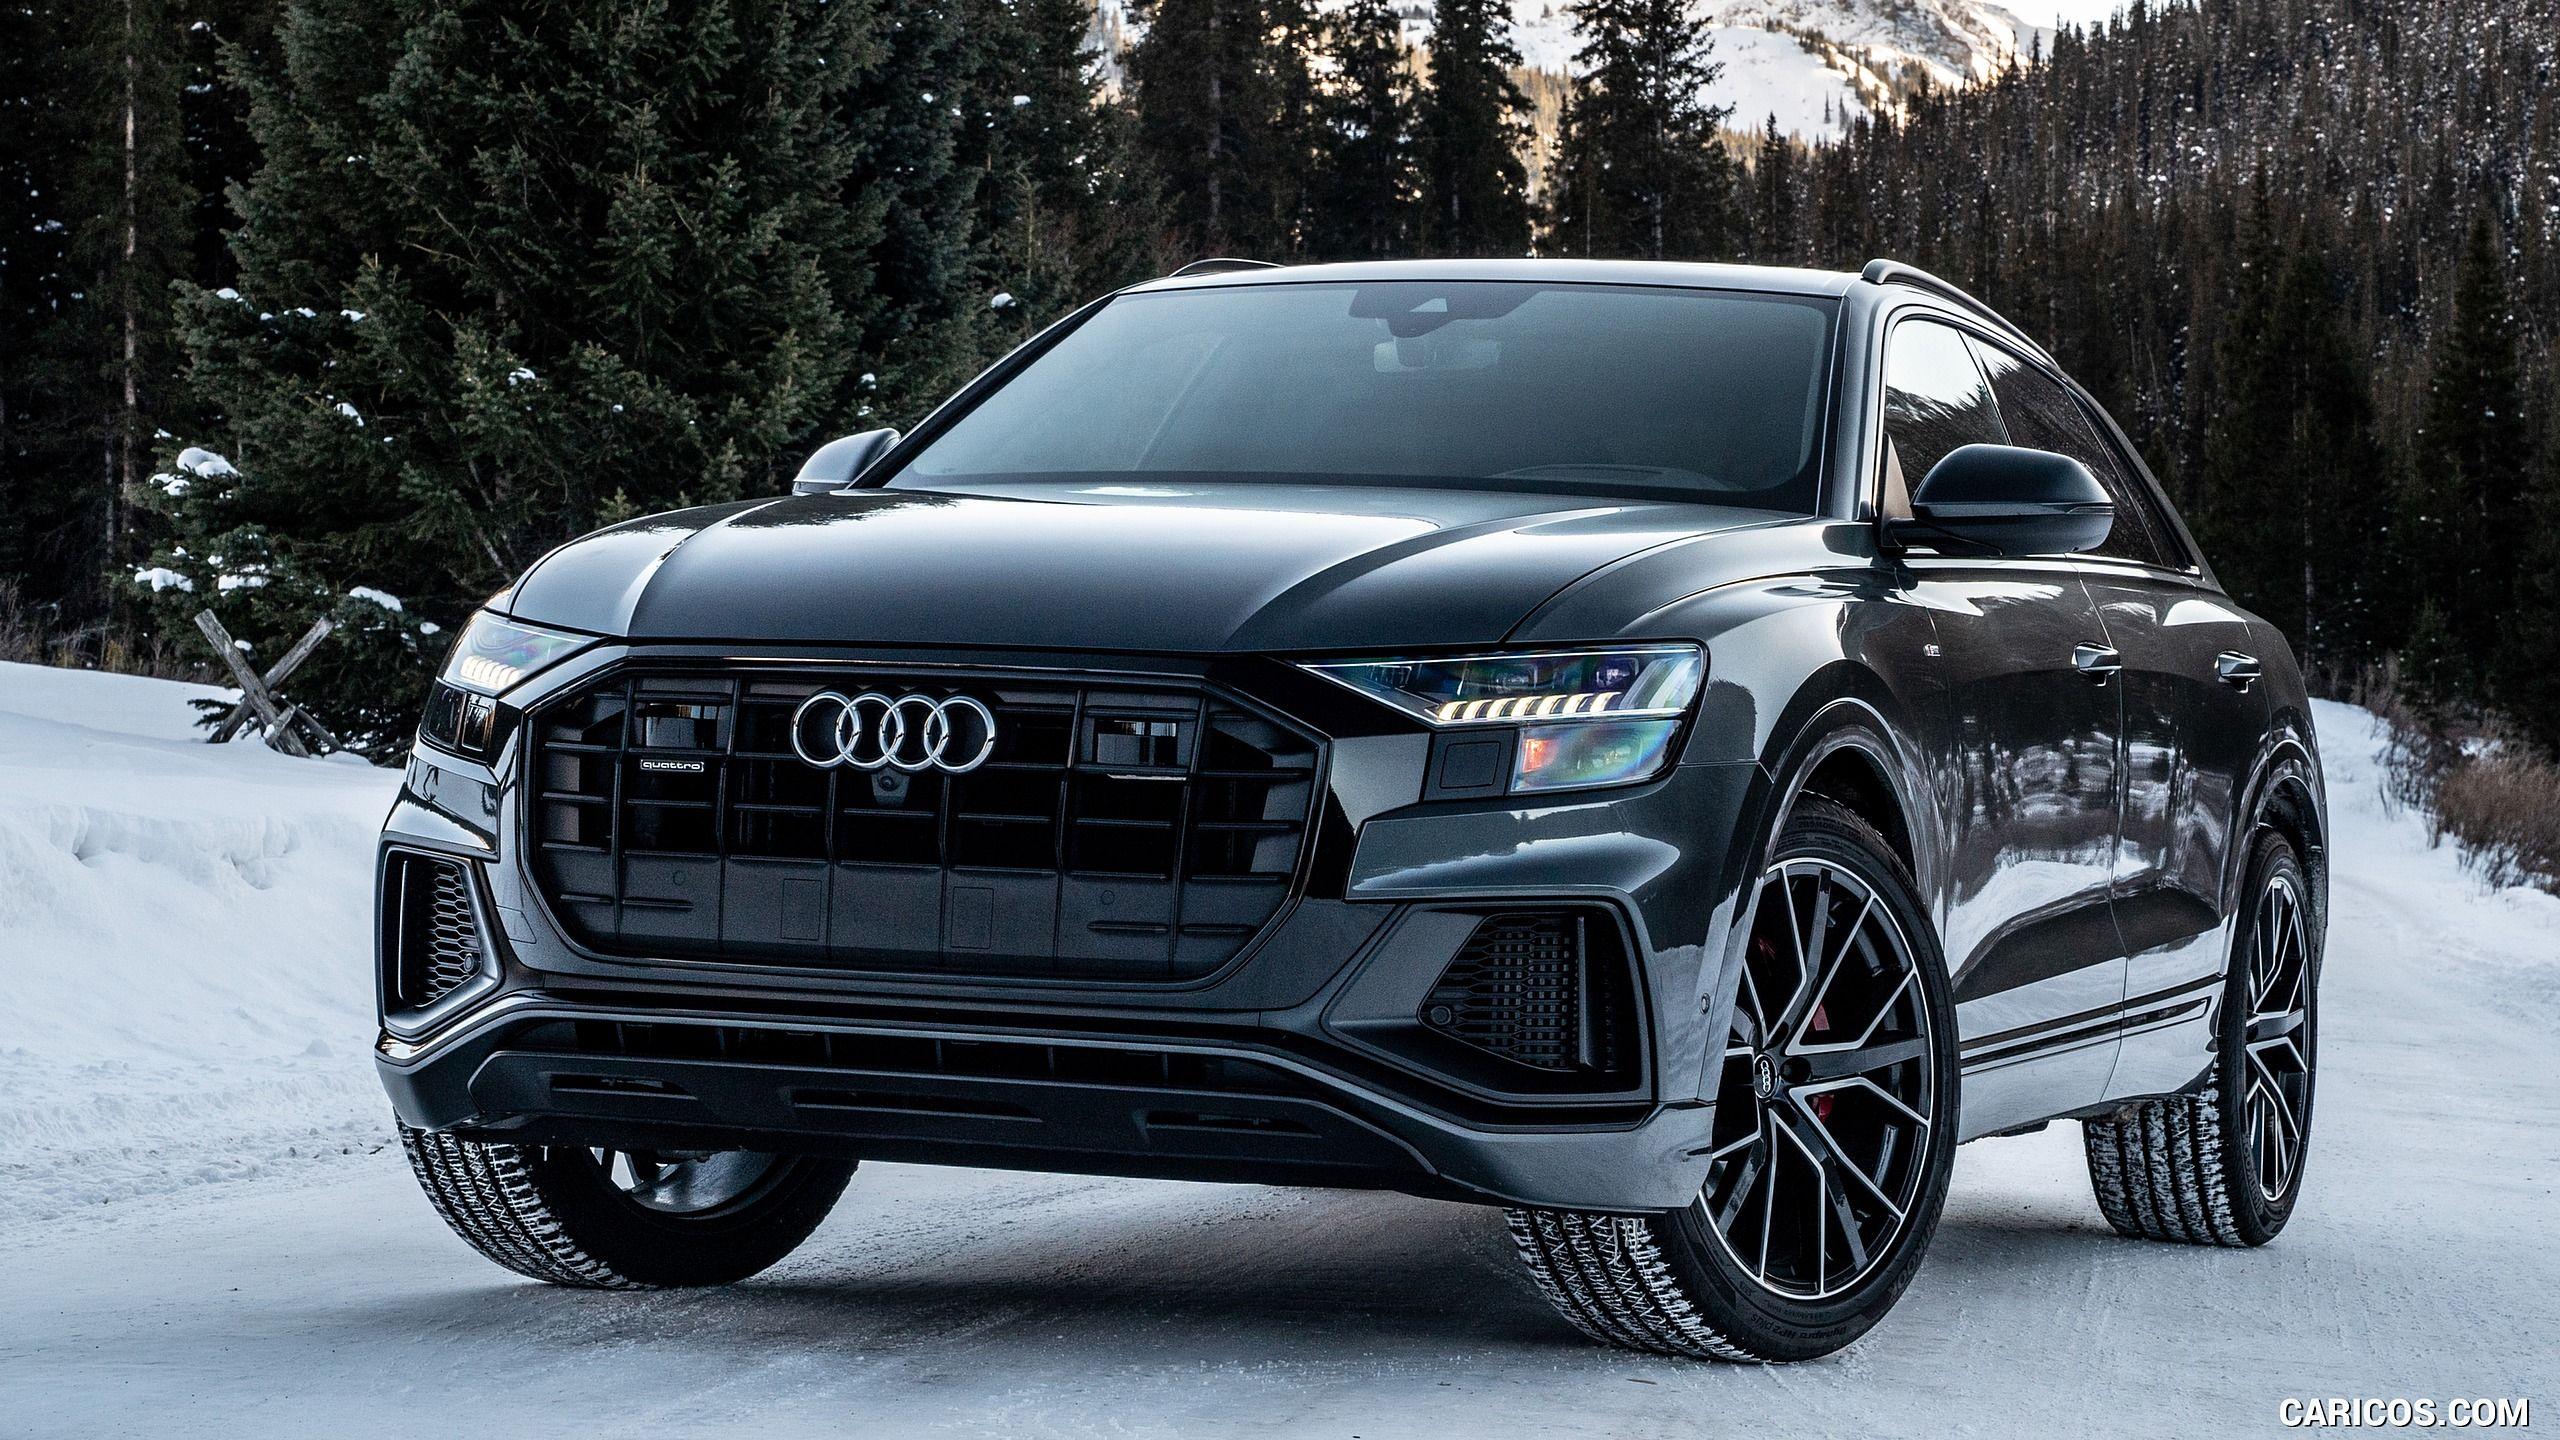 45+ Audi luxury suv Wallpaper